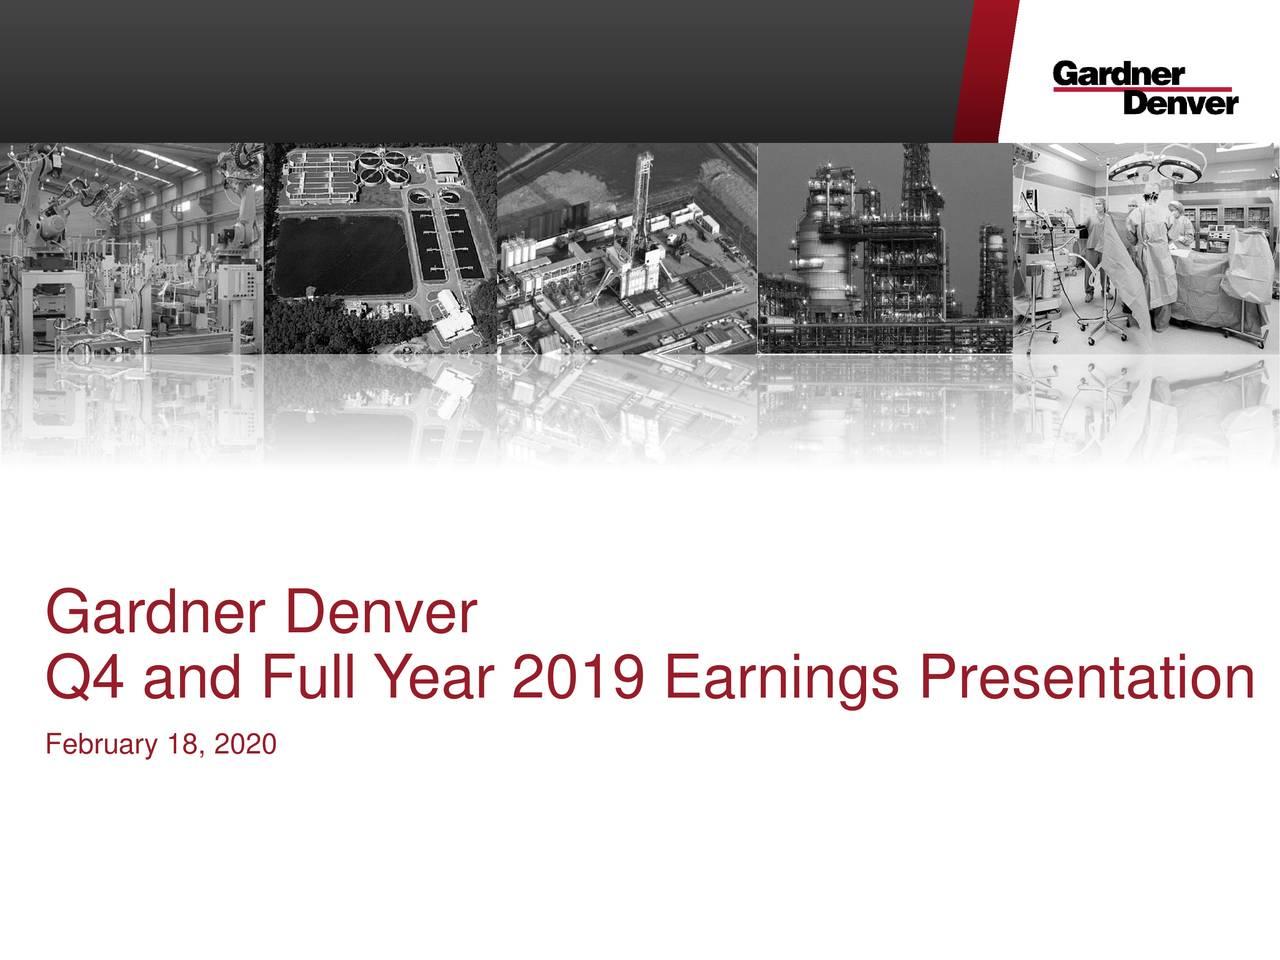 Gardner Denver Holdings, Inc. 2019 Q4 - Results - Earnings Call Presentation - Gardner Denver Holdings, Inc. (NYSE:GDI) | Seeking Alpha